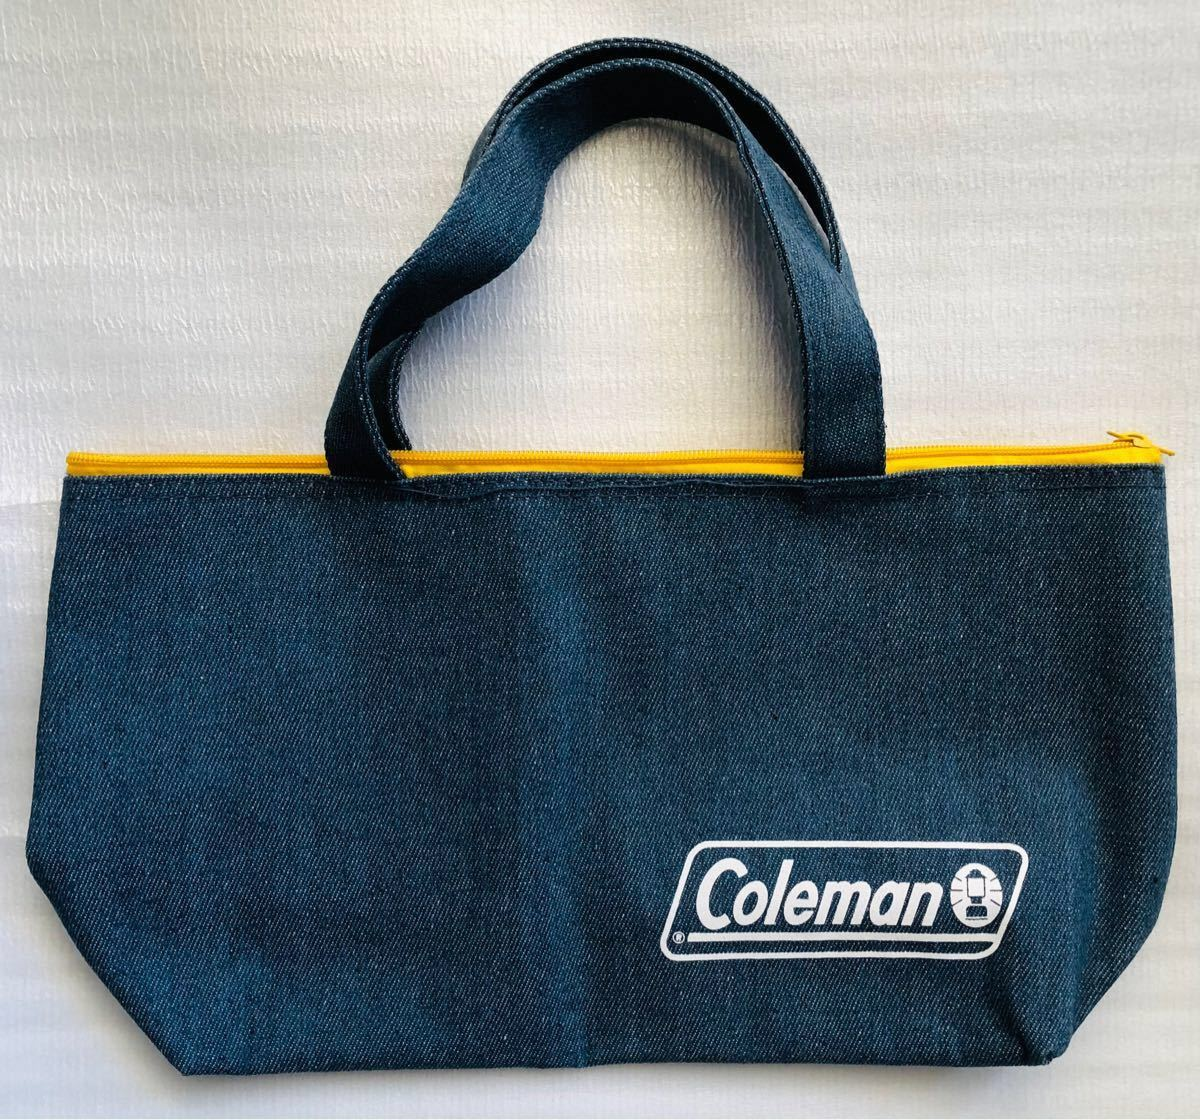 Coleman コールマン クーラーバッグ  保冷バッグ